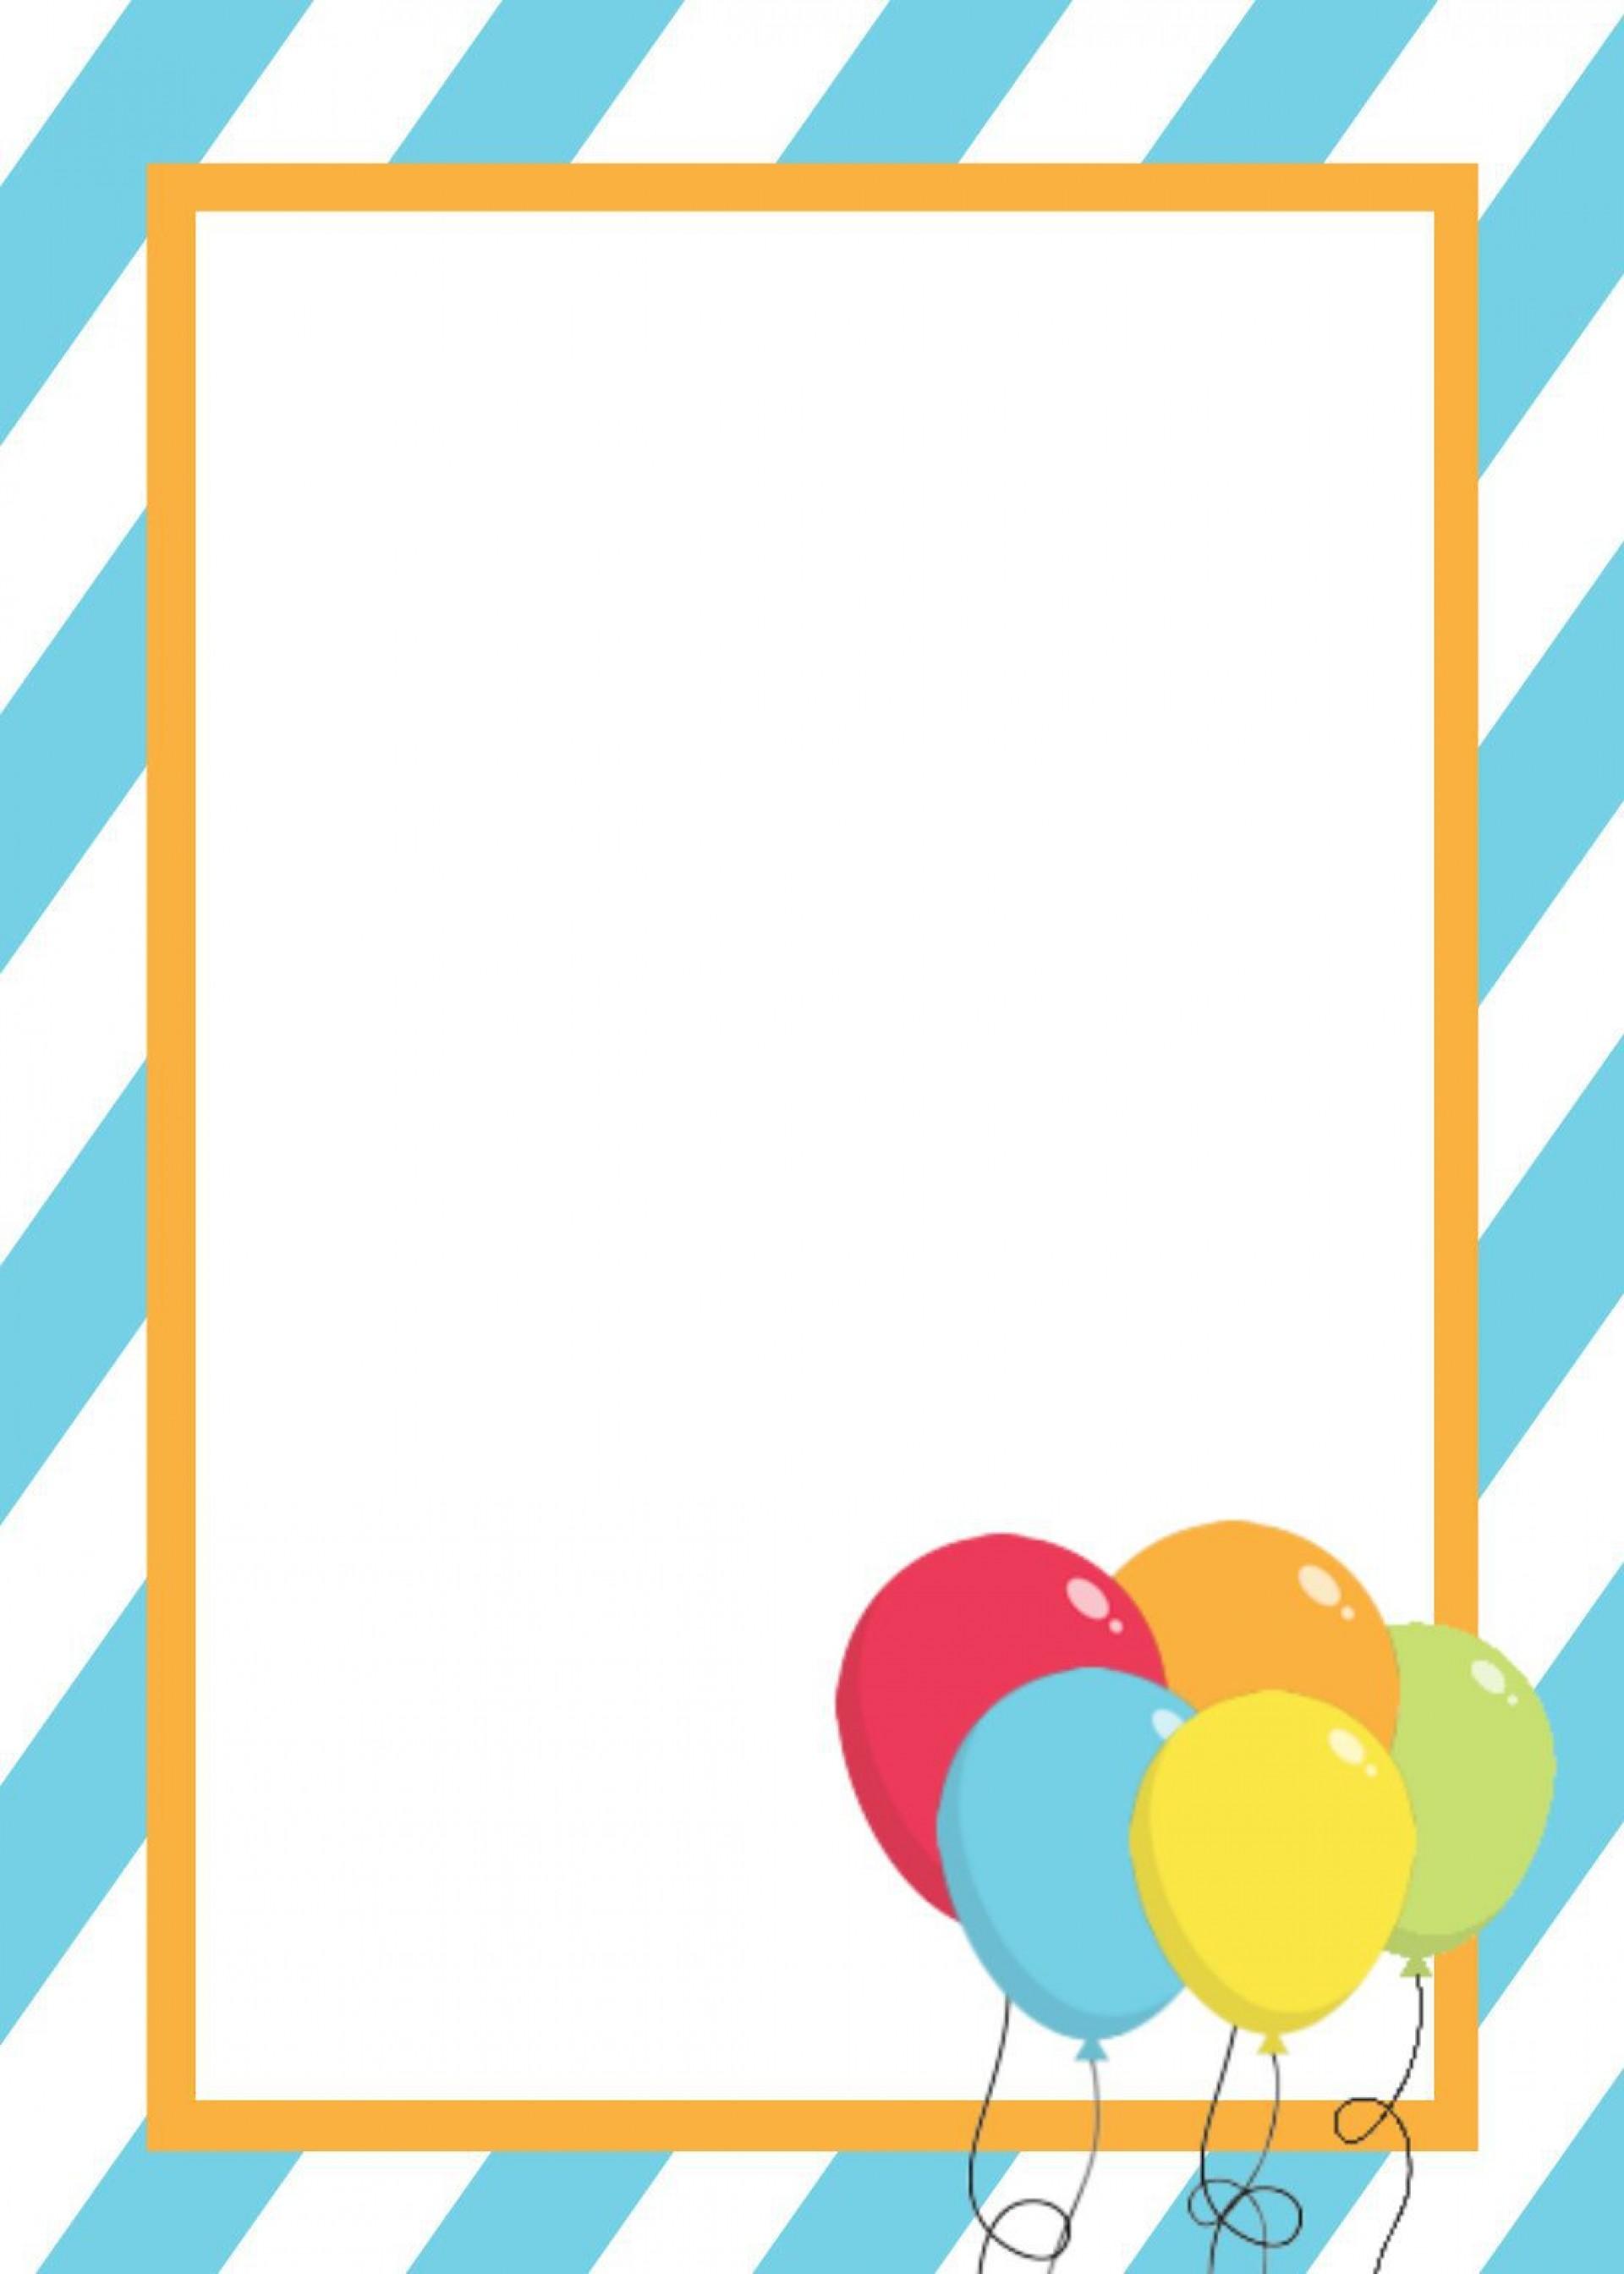 000 Breathtaking Free Invite Design Printable Photo  Wedding Place Card Template Birthday To Print1920